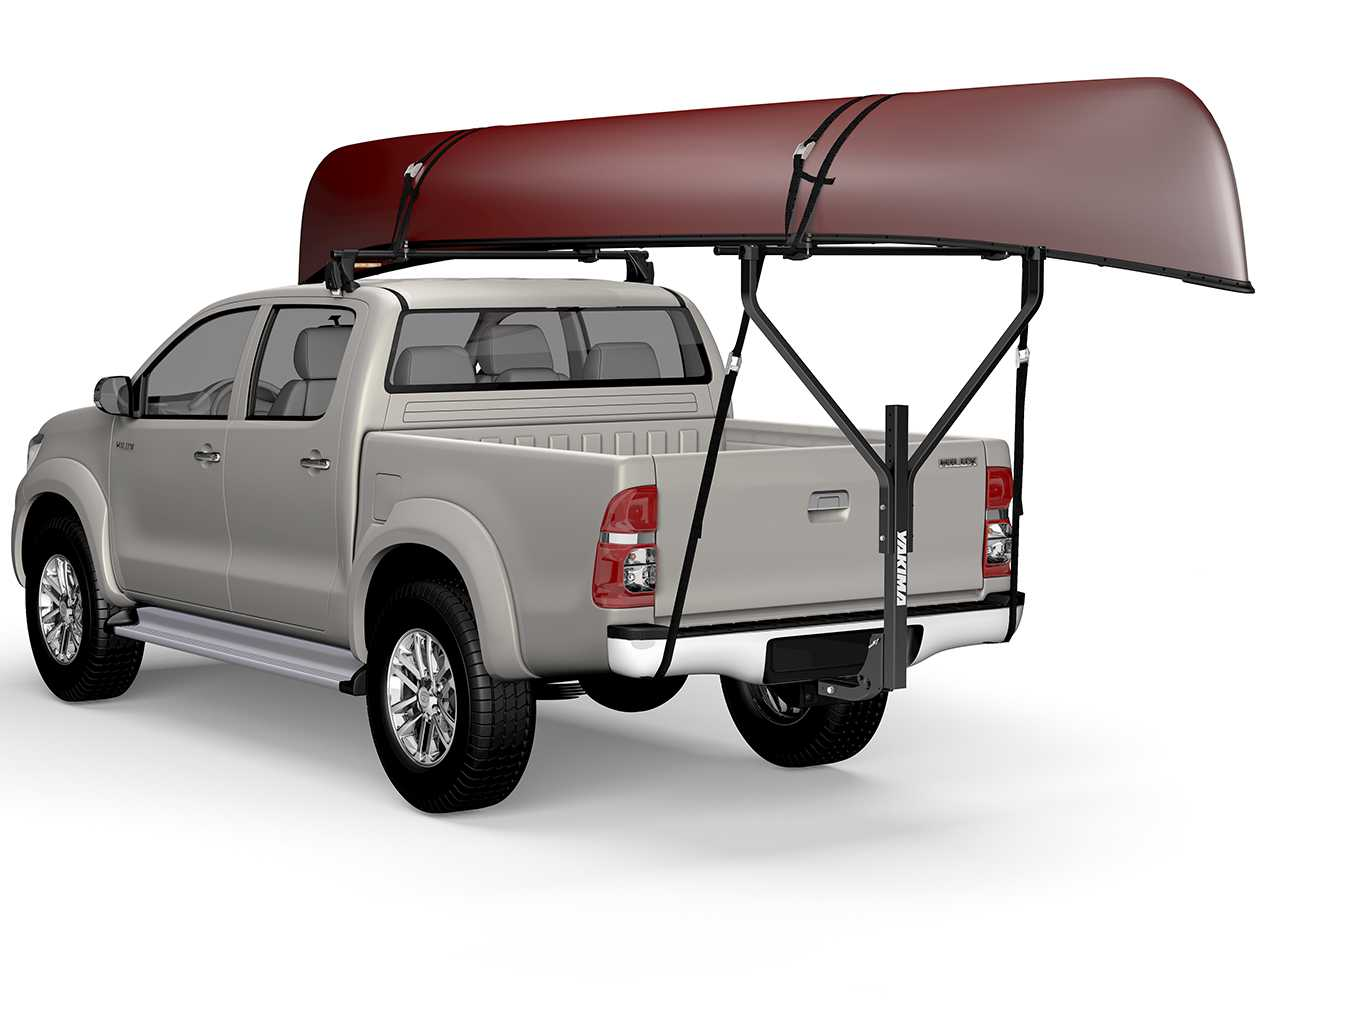 Recreational Truck Bed Racks